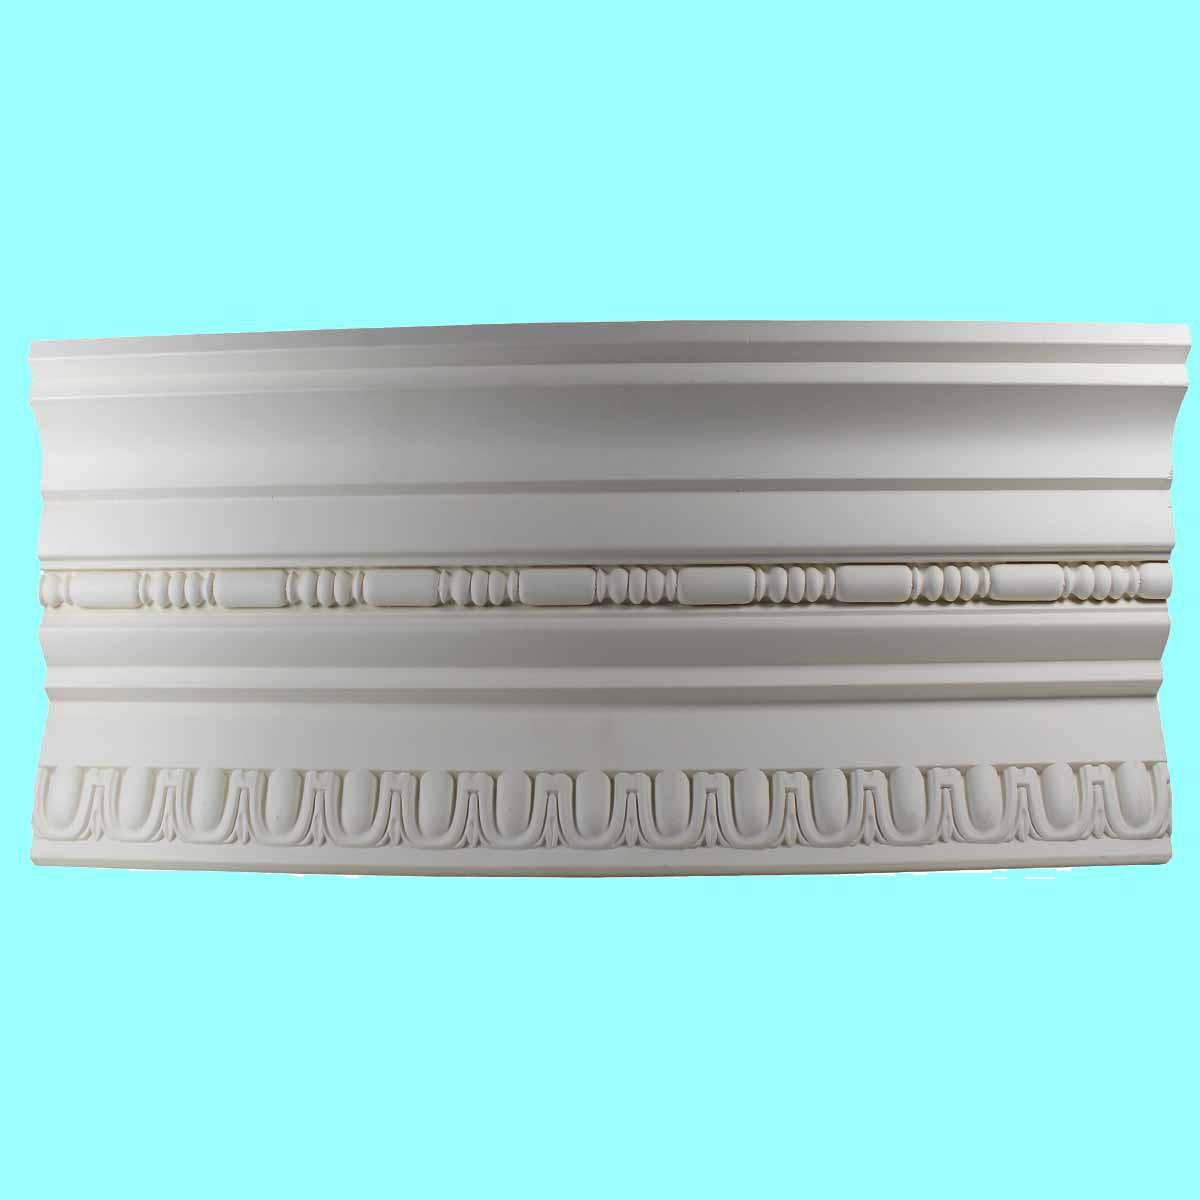 Cornice White Urethane 24 Sample of 11382 Cornice Cornice Moulding Cornice Molding